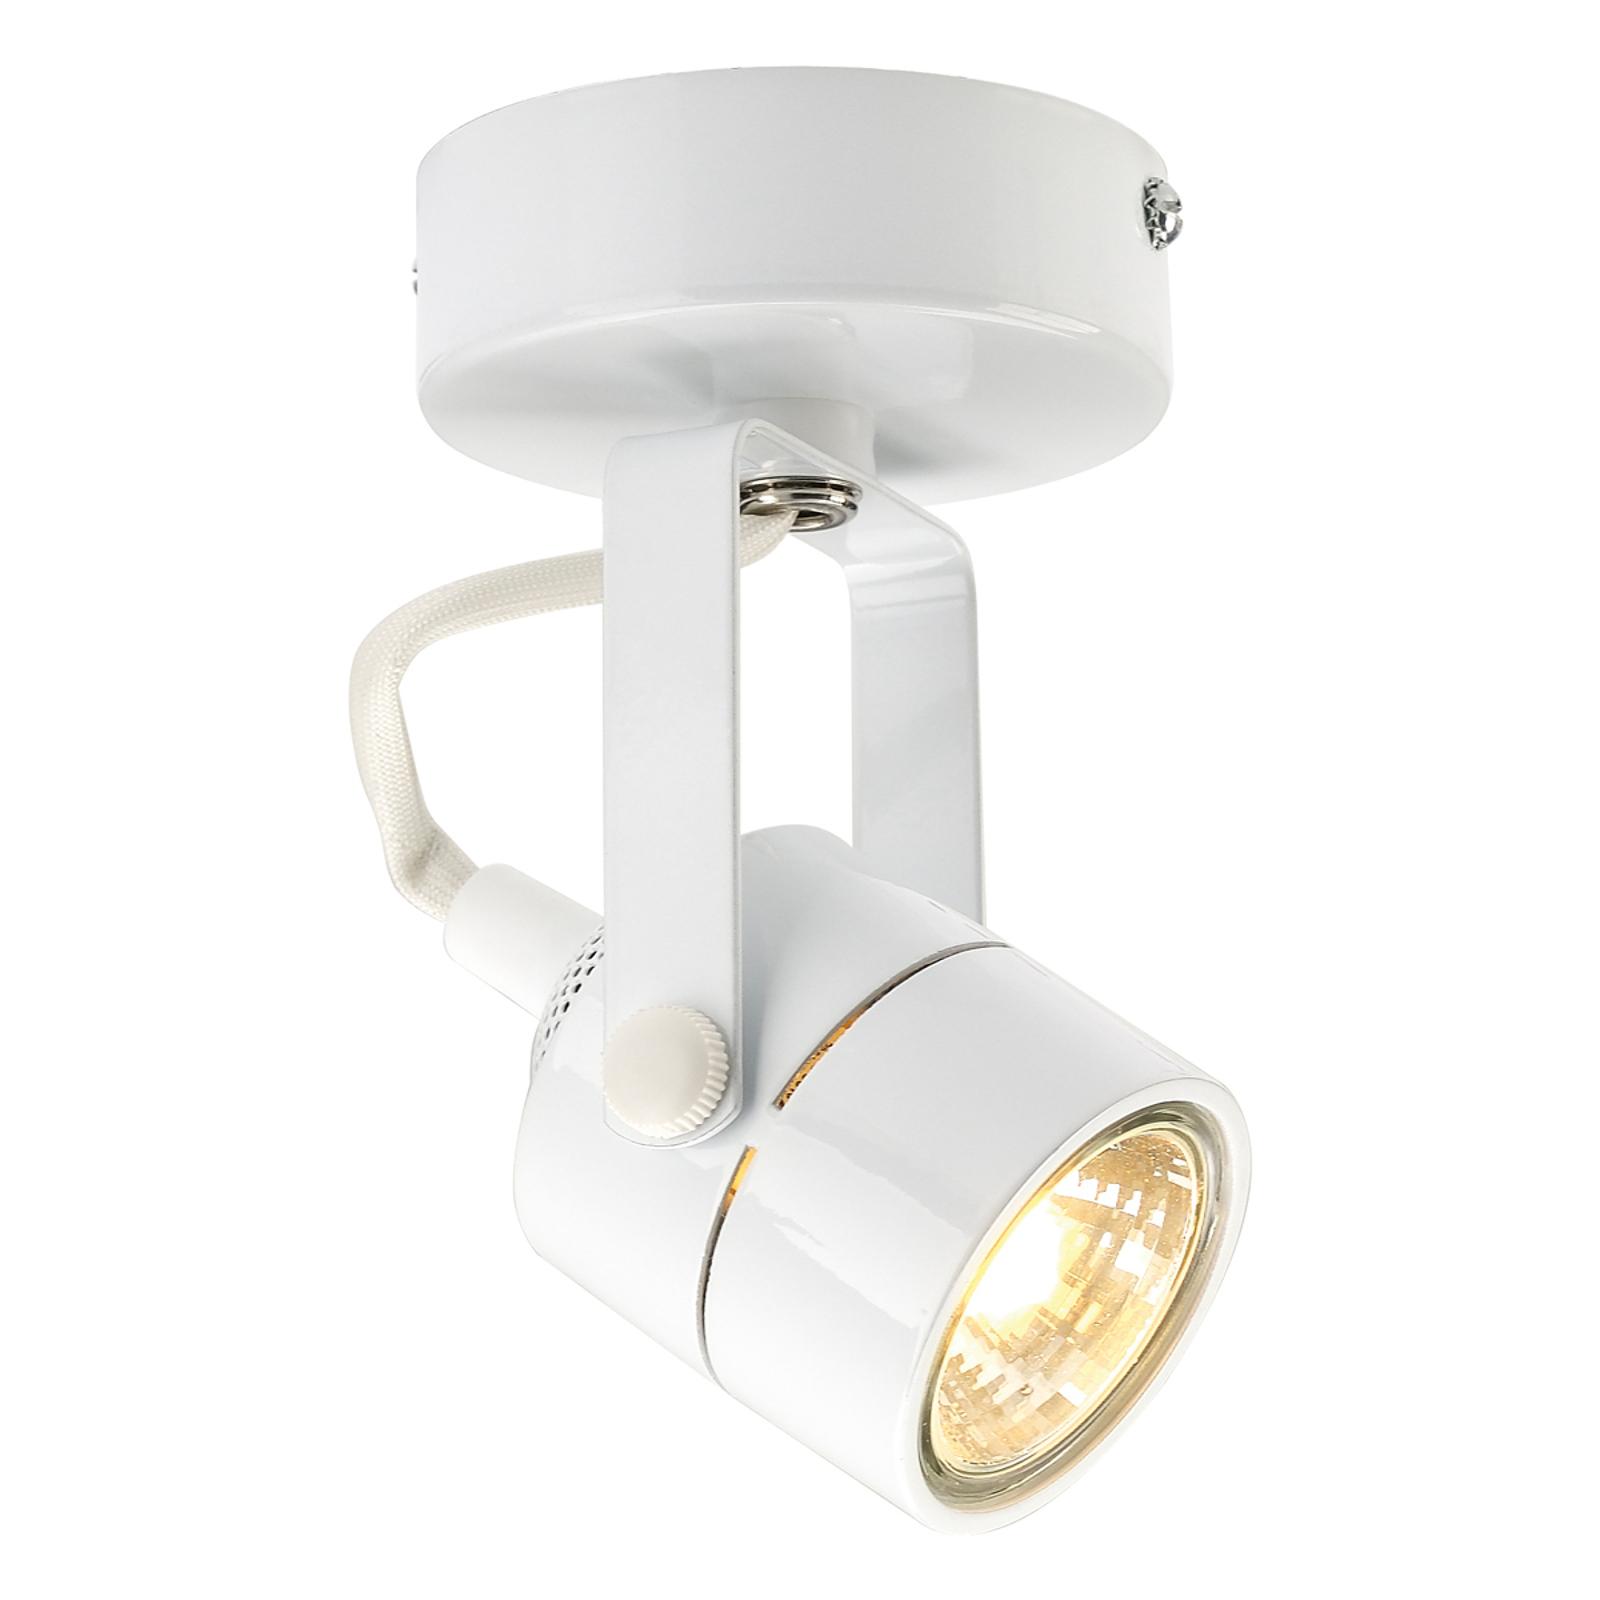 Wand- en plafondlamp SPOT 79 230V wit